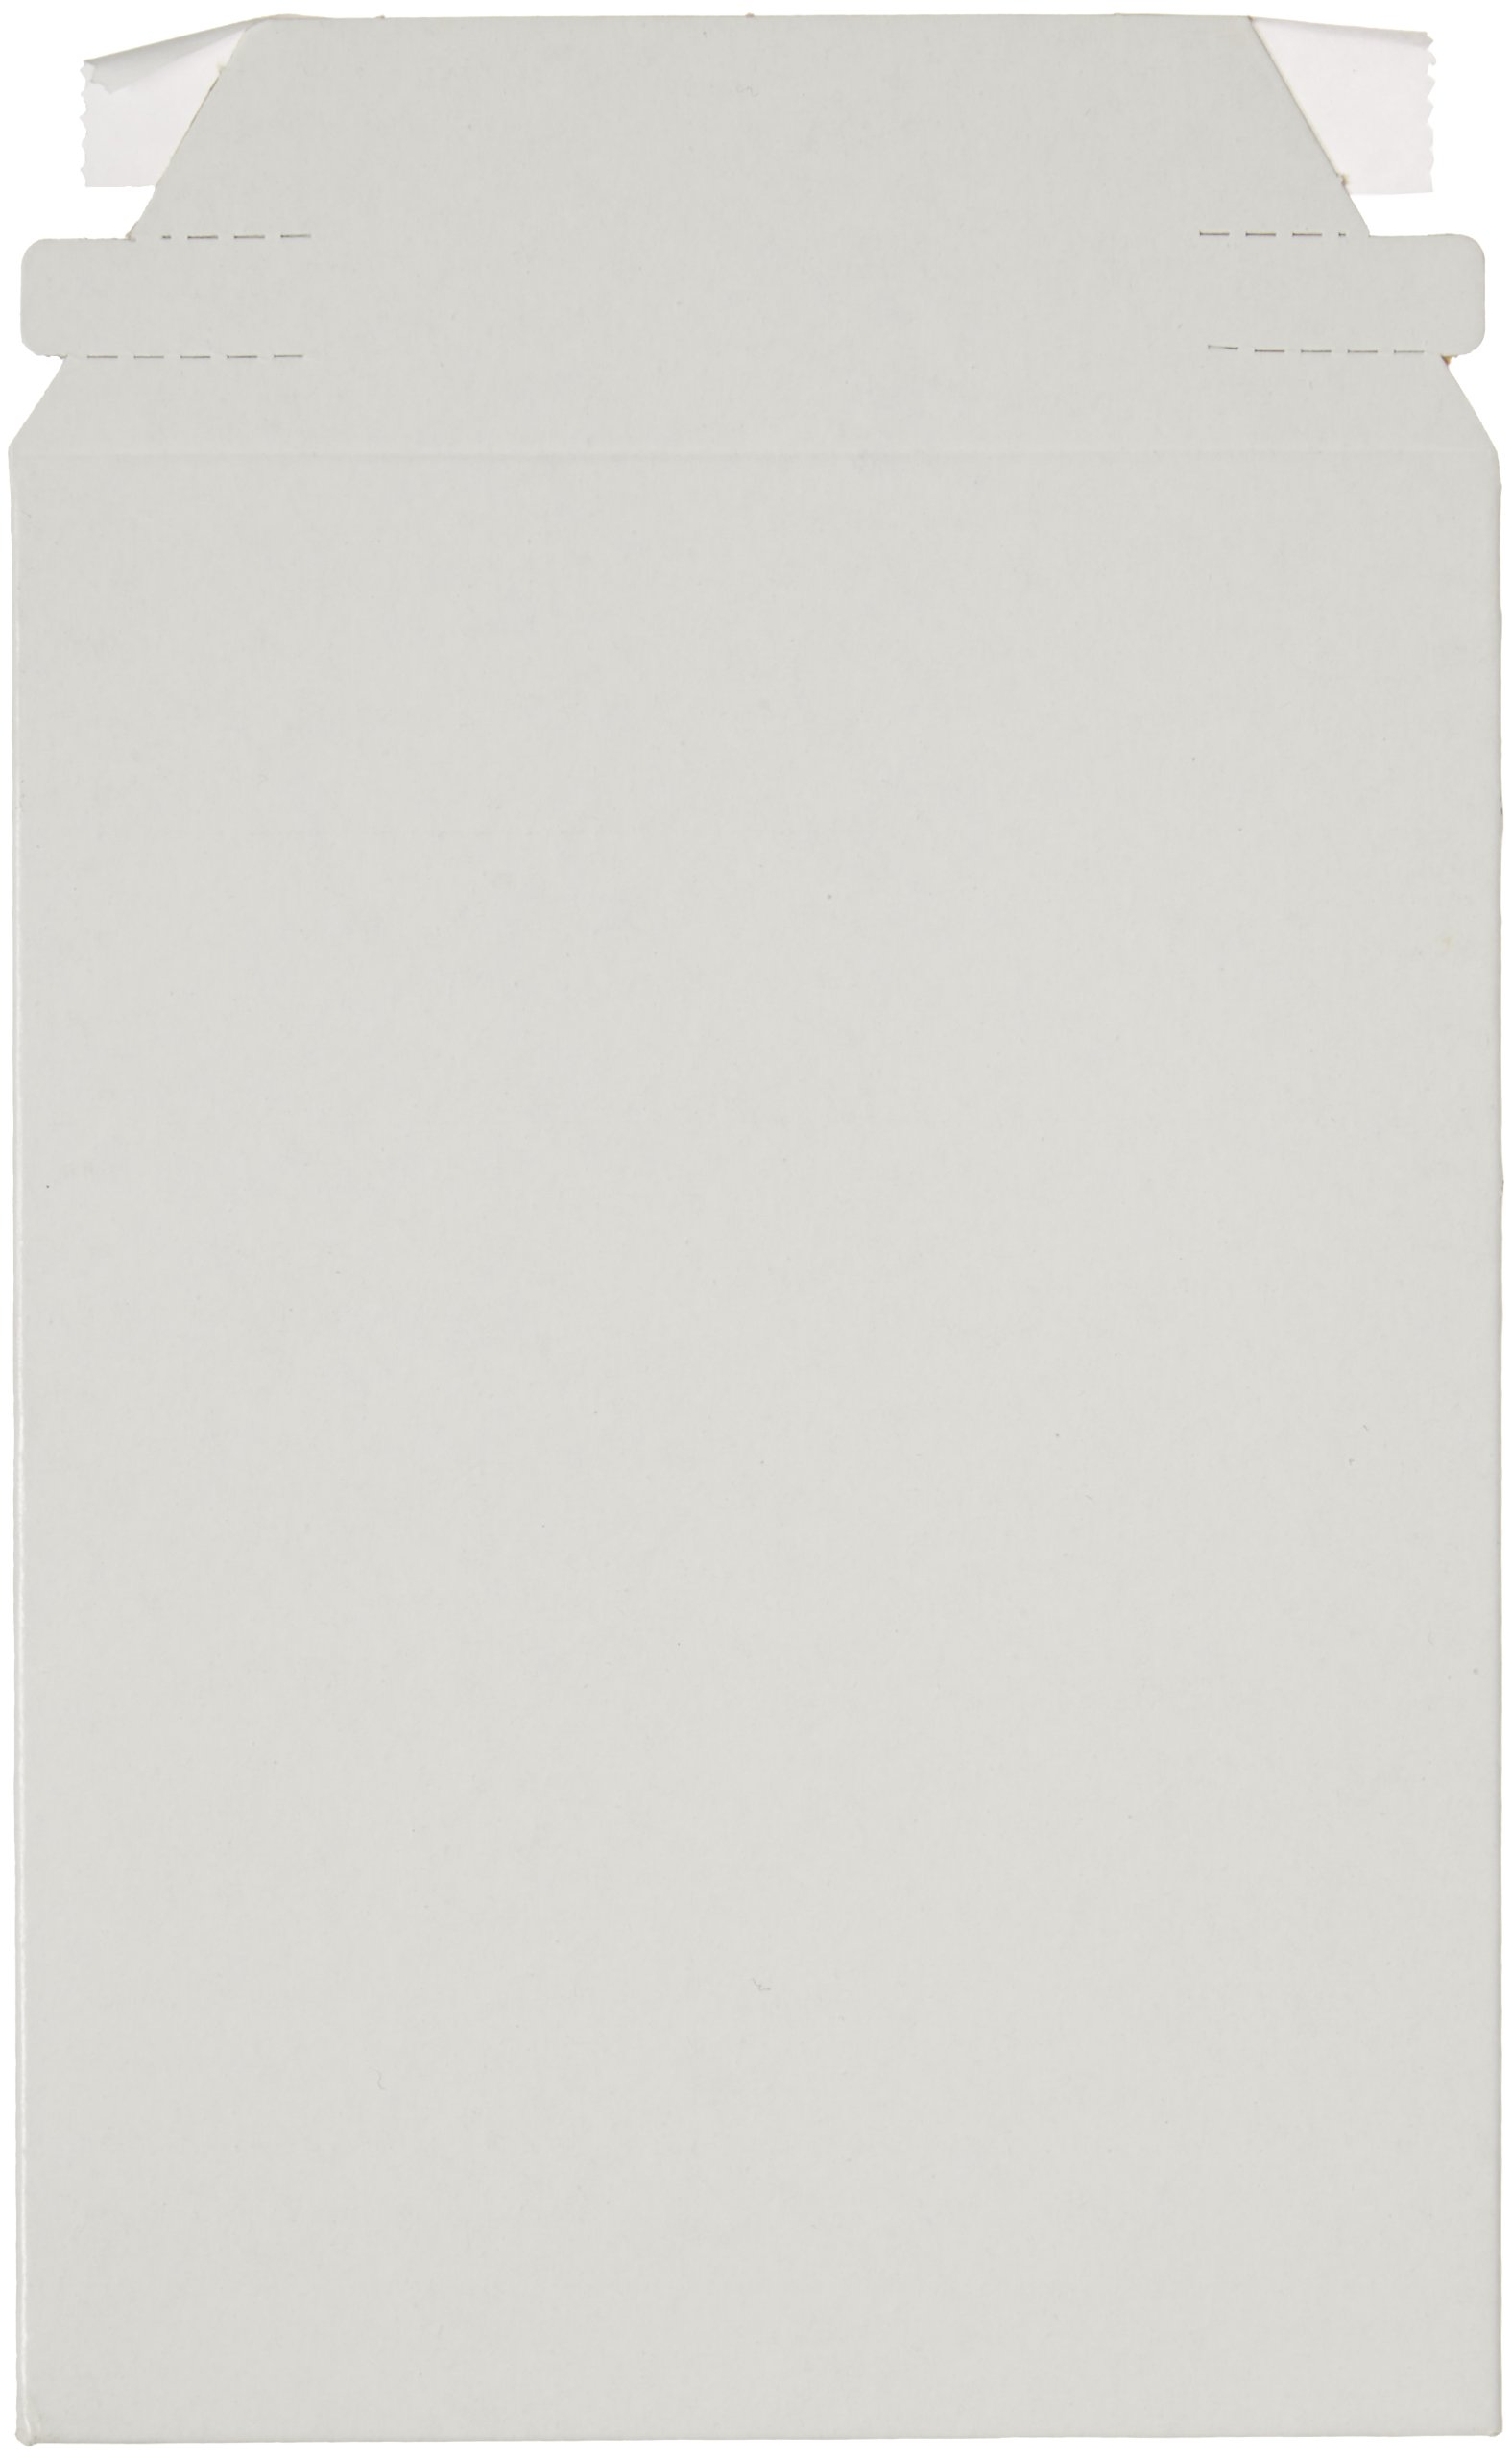 Pratt MJ-1 Self-Seal Stay Flat Mailer, White, 6'' x 8'' (Pack of 100) by Pratt